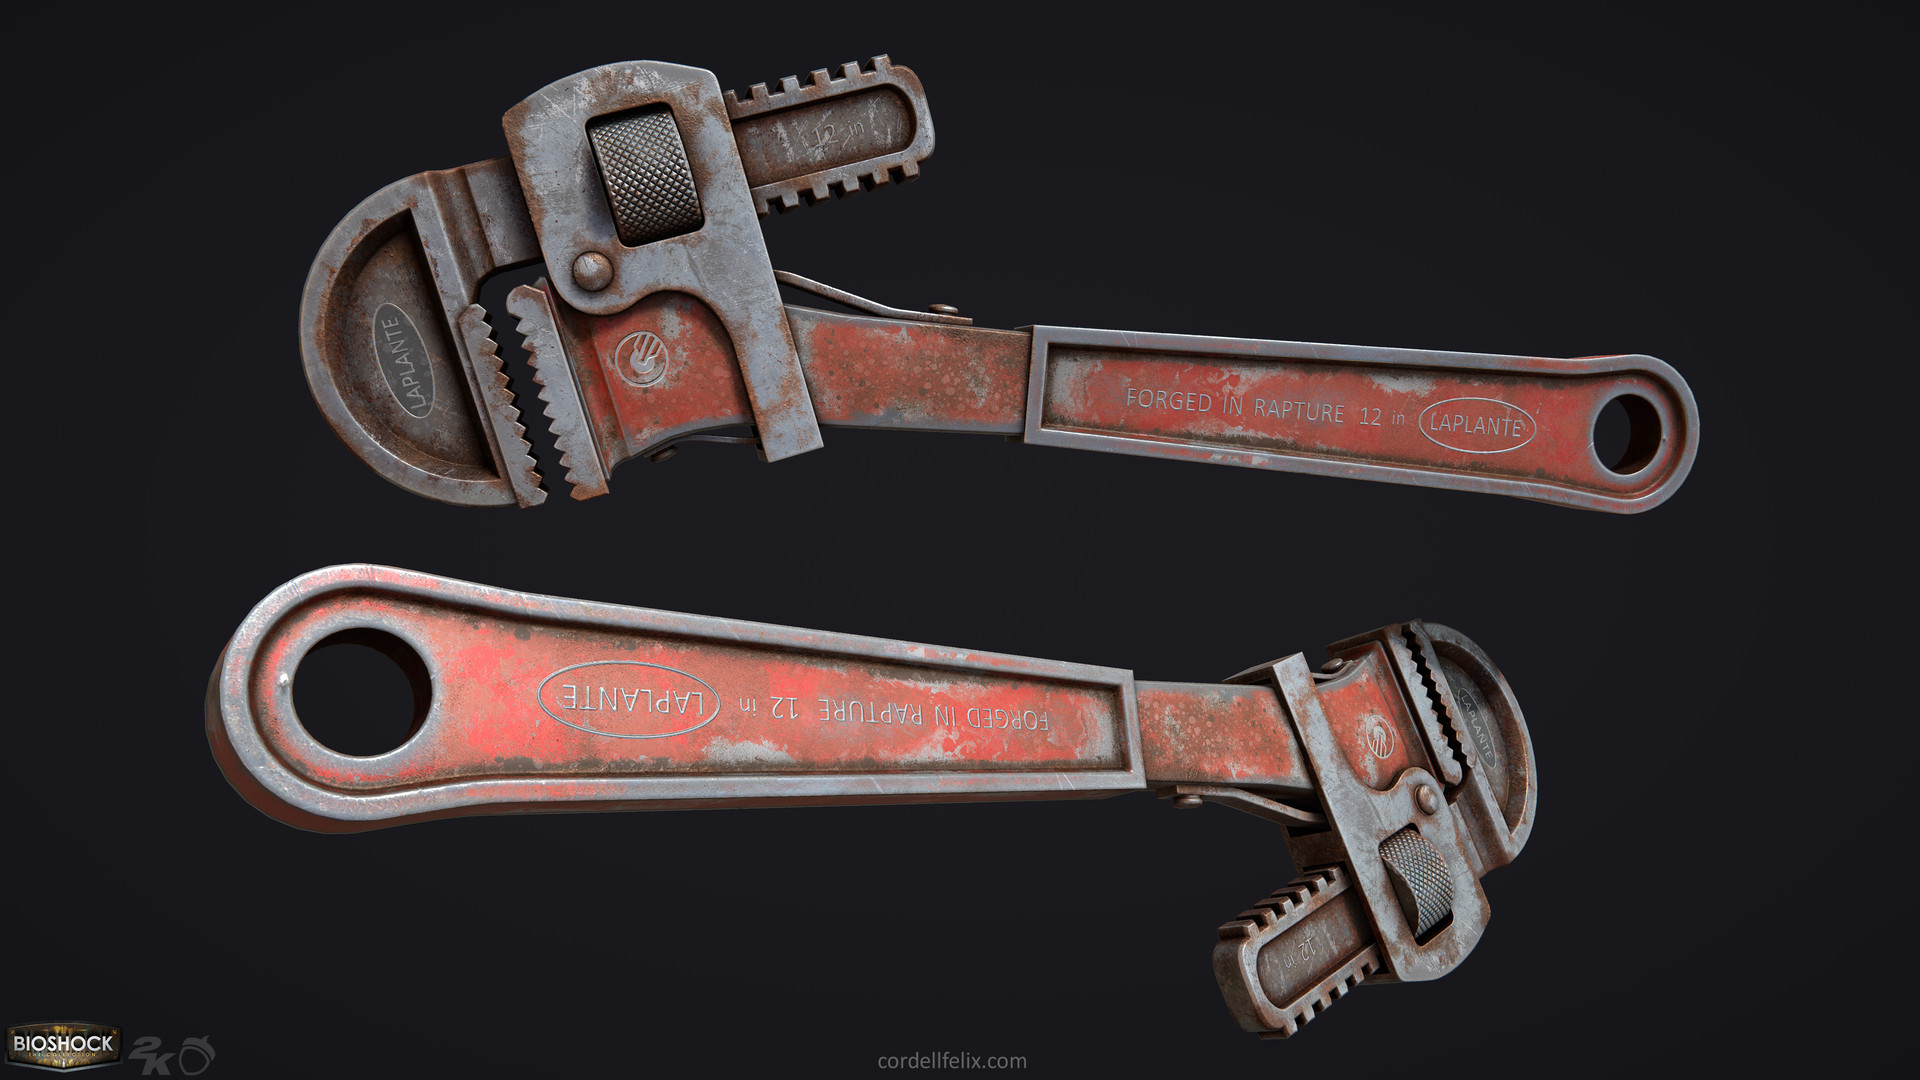 Cordell felix cordellfelix bioshock wrench 04